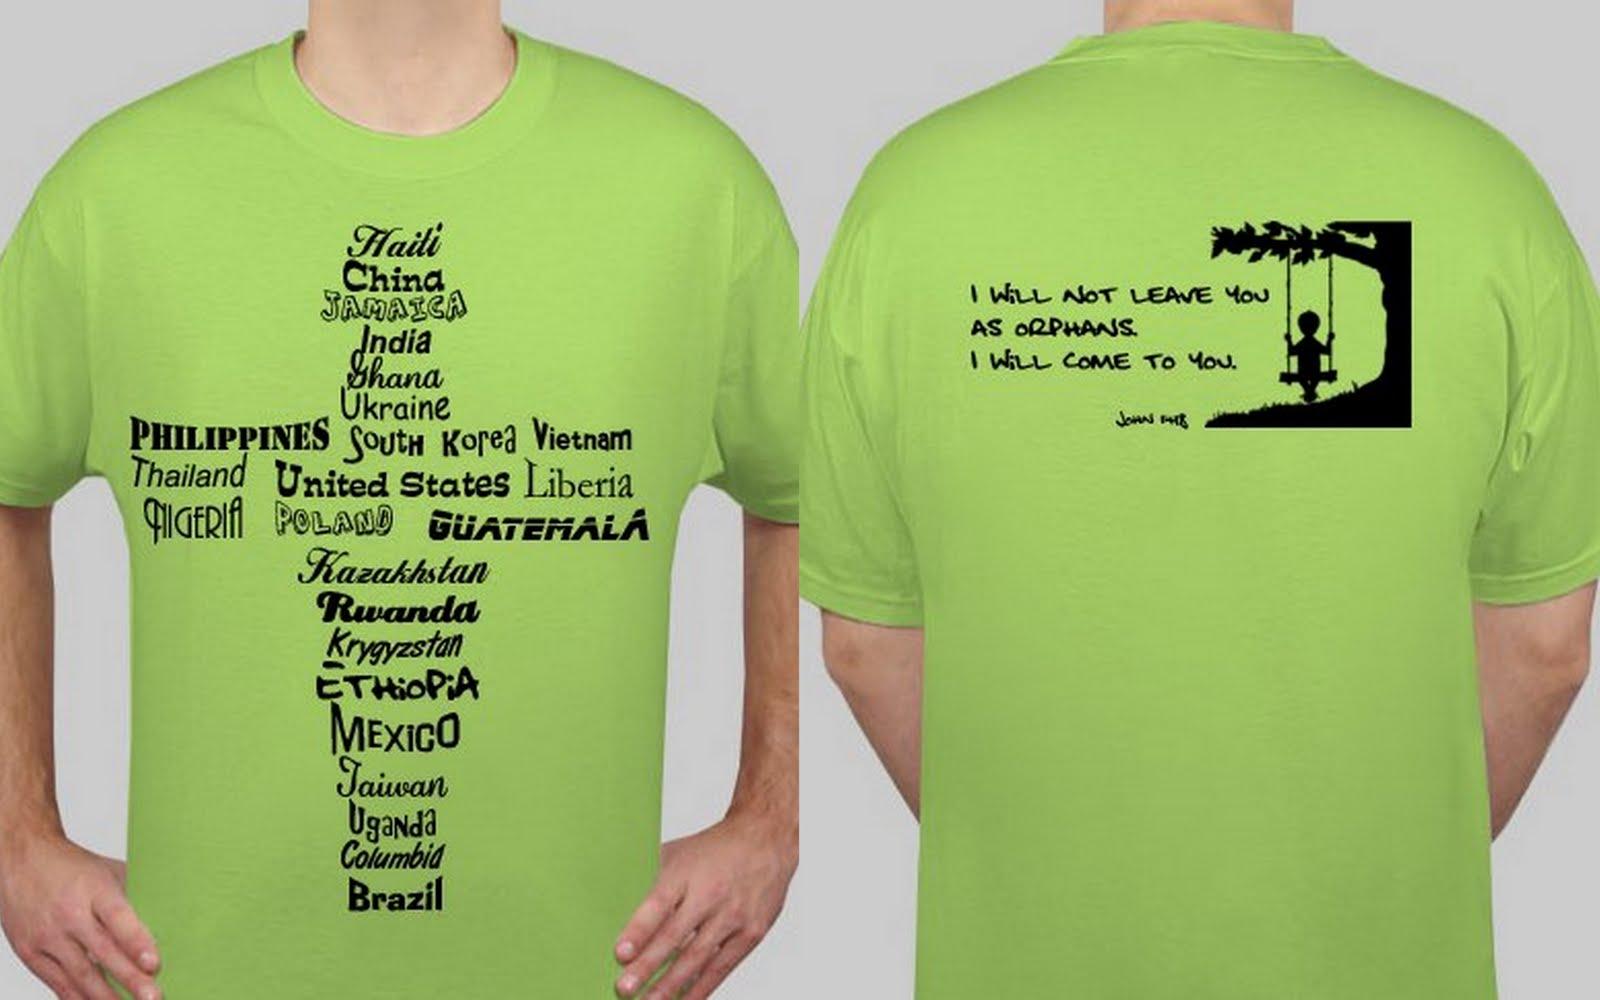 Windex and waiting rooms adoption t shirts fundraiser for Adoption fundraiser t shirts